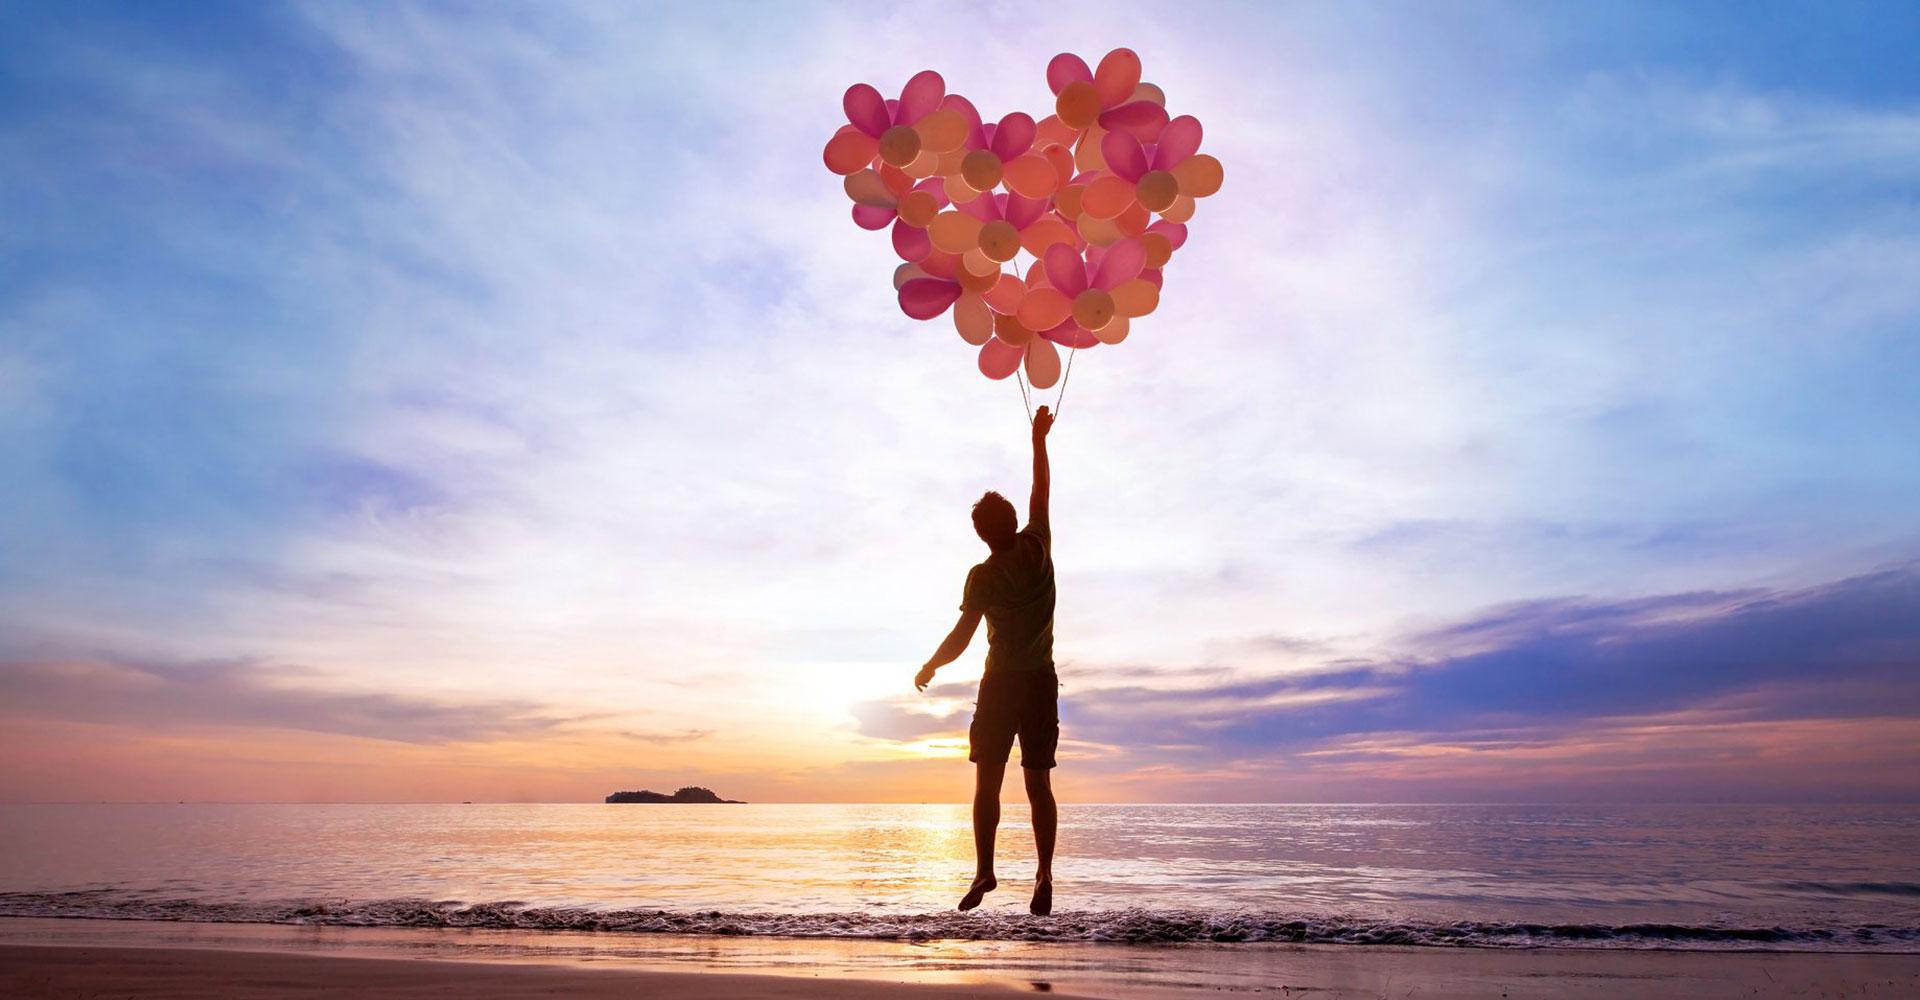 slide-beach-baloons